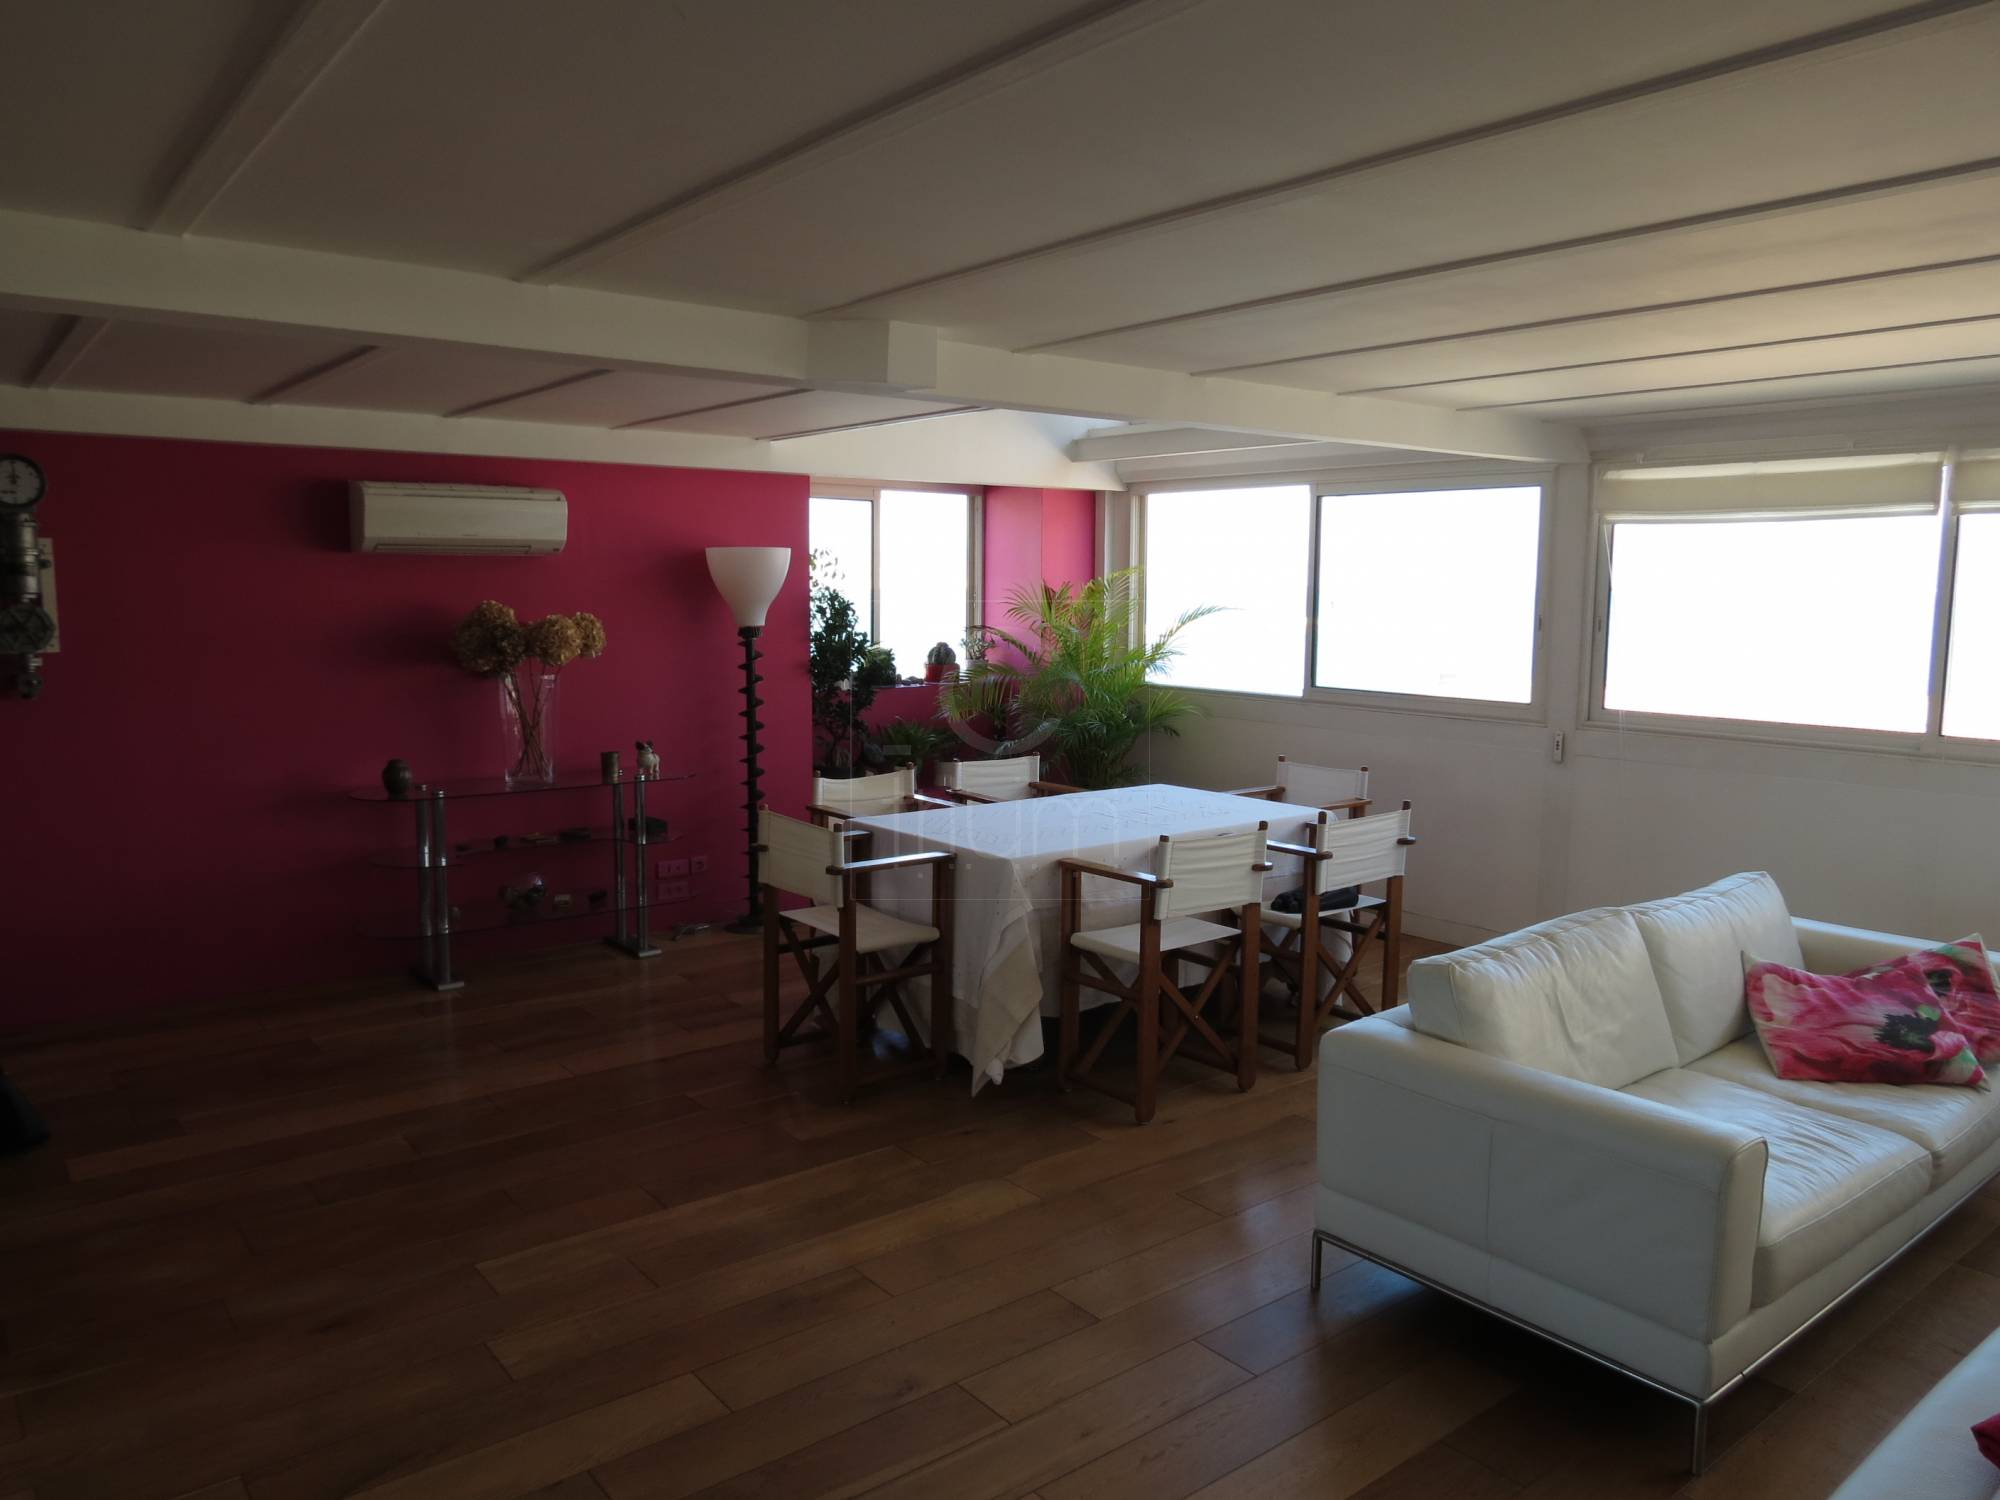 vente appartement t3 f3 marseille 7eme corniche duplex vue mer agence immobili re marseille 7 me. Black Bedroom Furniture Sets. Home Design Ideas